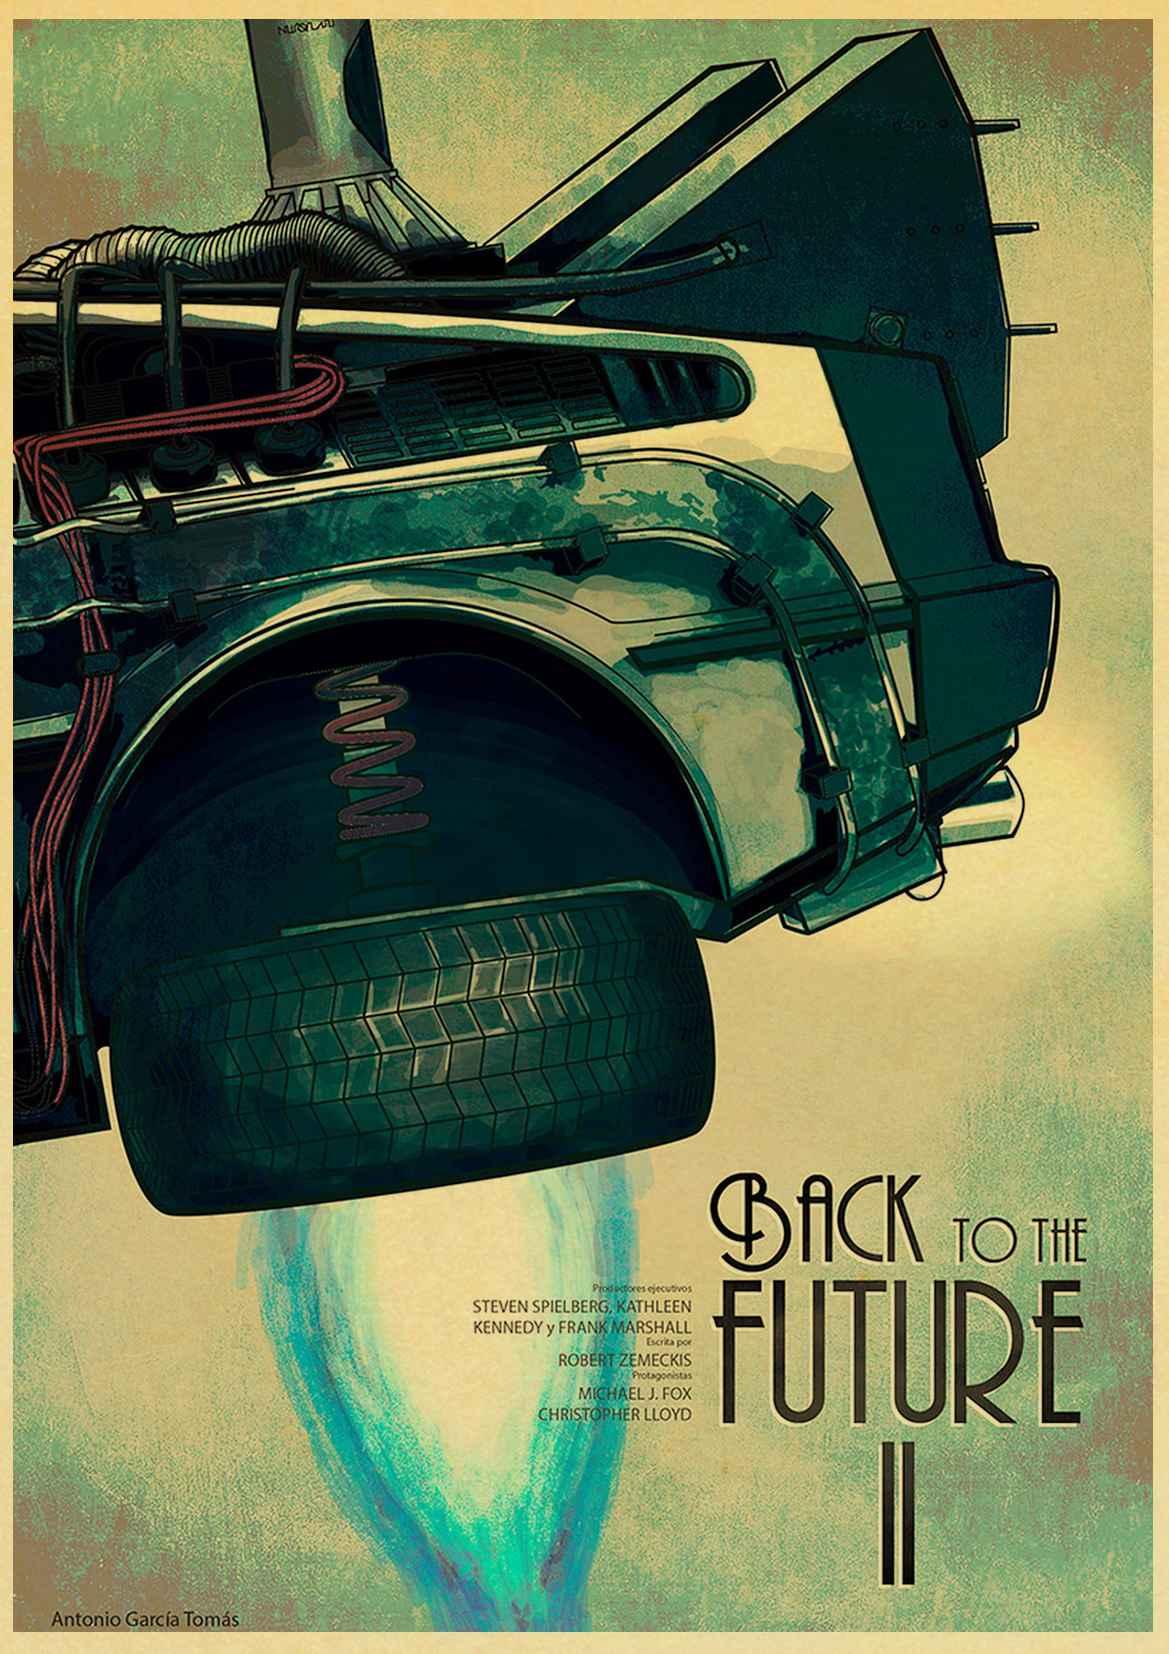 HTB1hdT9leuSBuNjSsziq6zq8pXal Sci-fi Back to The Future Film Propaganda Retro Kraft Poster Decorative DIY Wall Canvas Sticker Home Bar Art Posters Decor